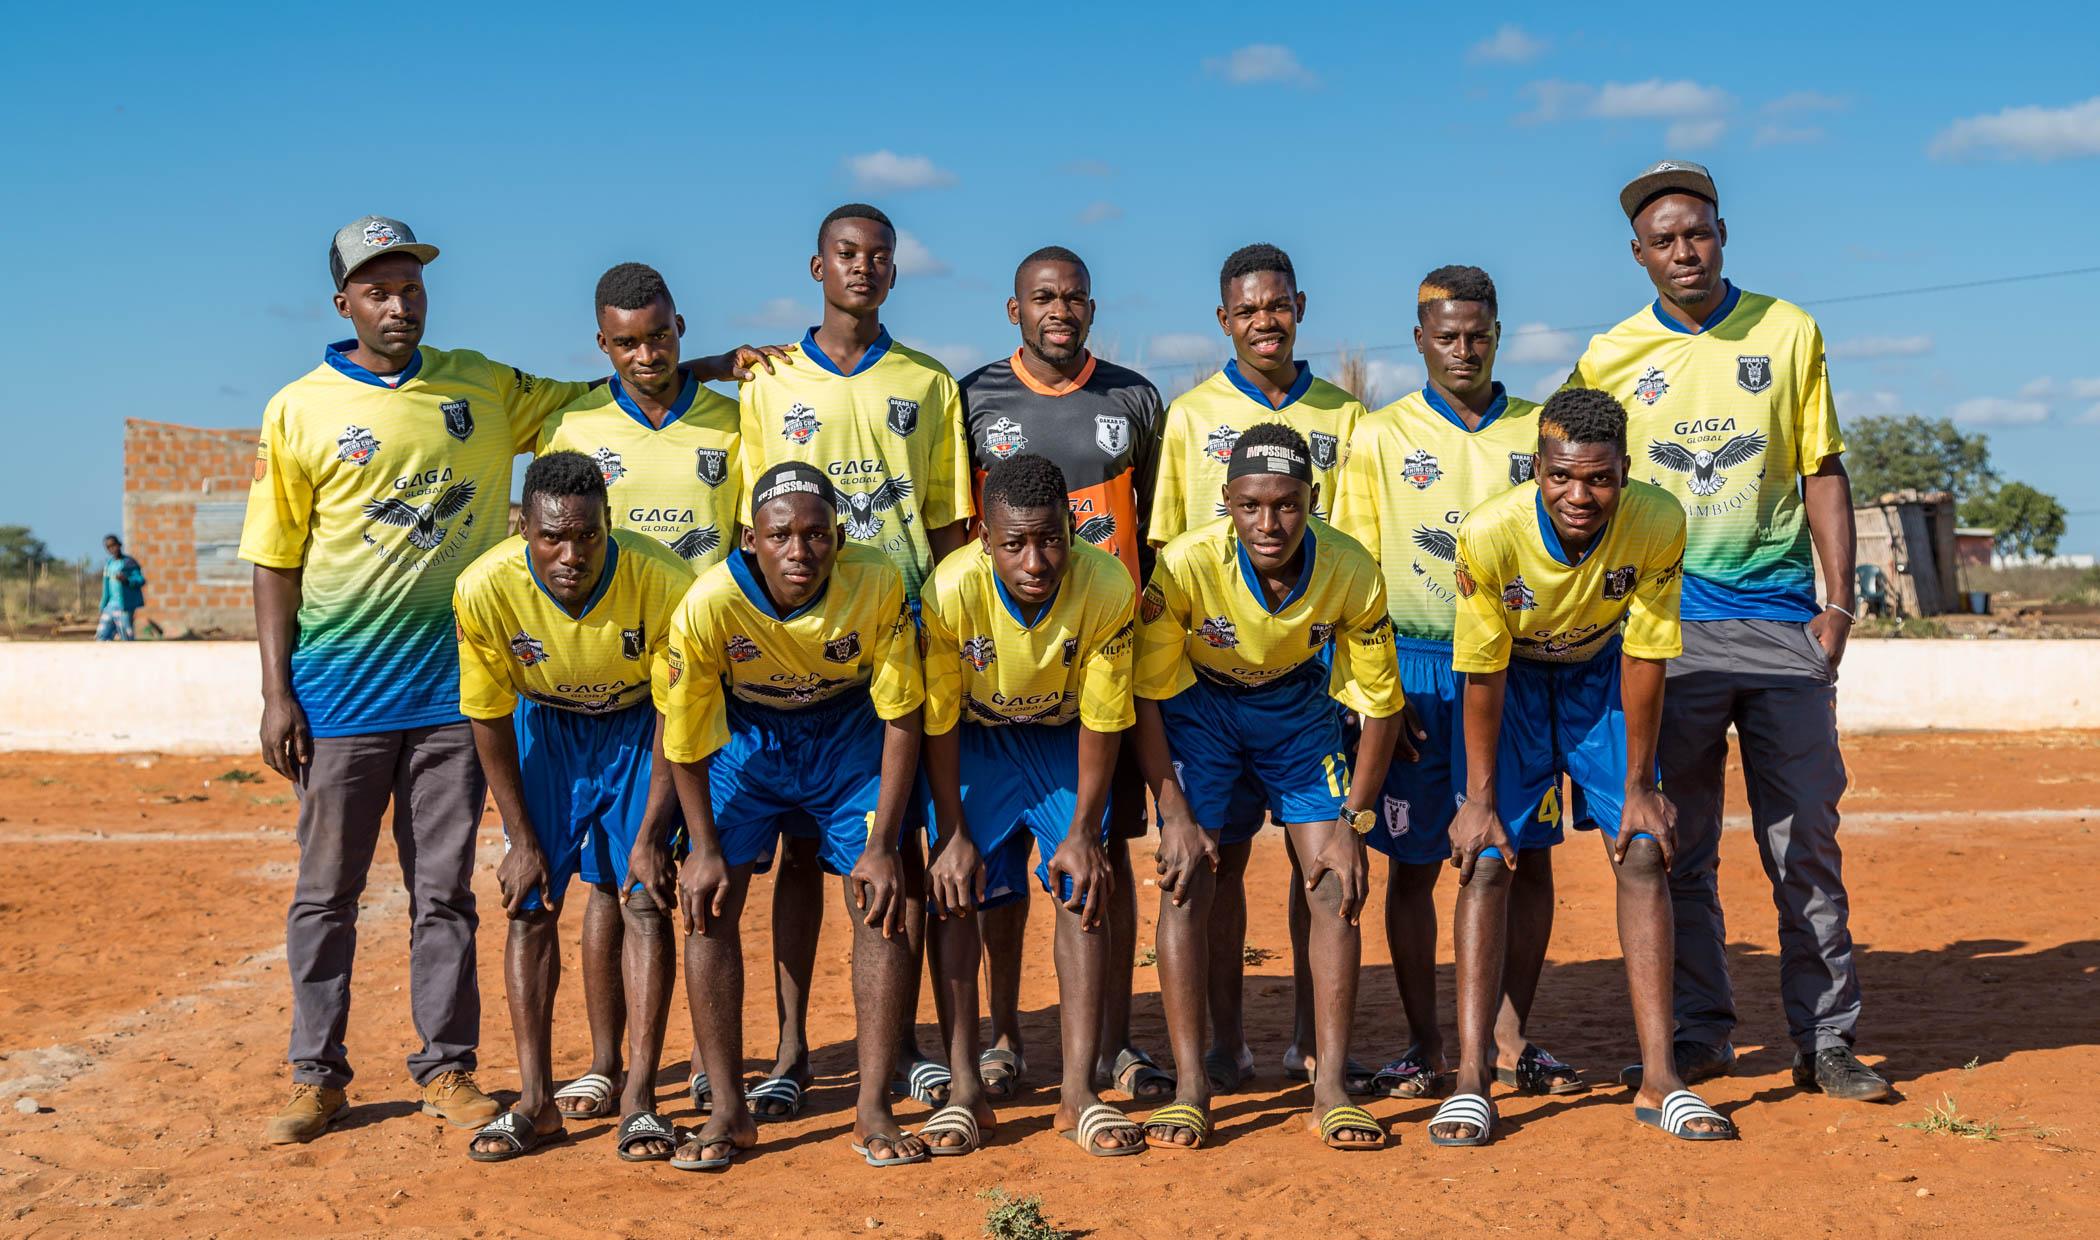 Dakar FC Zebras Team Photo, Rhino Cup Champions League, May 2019